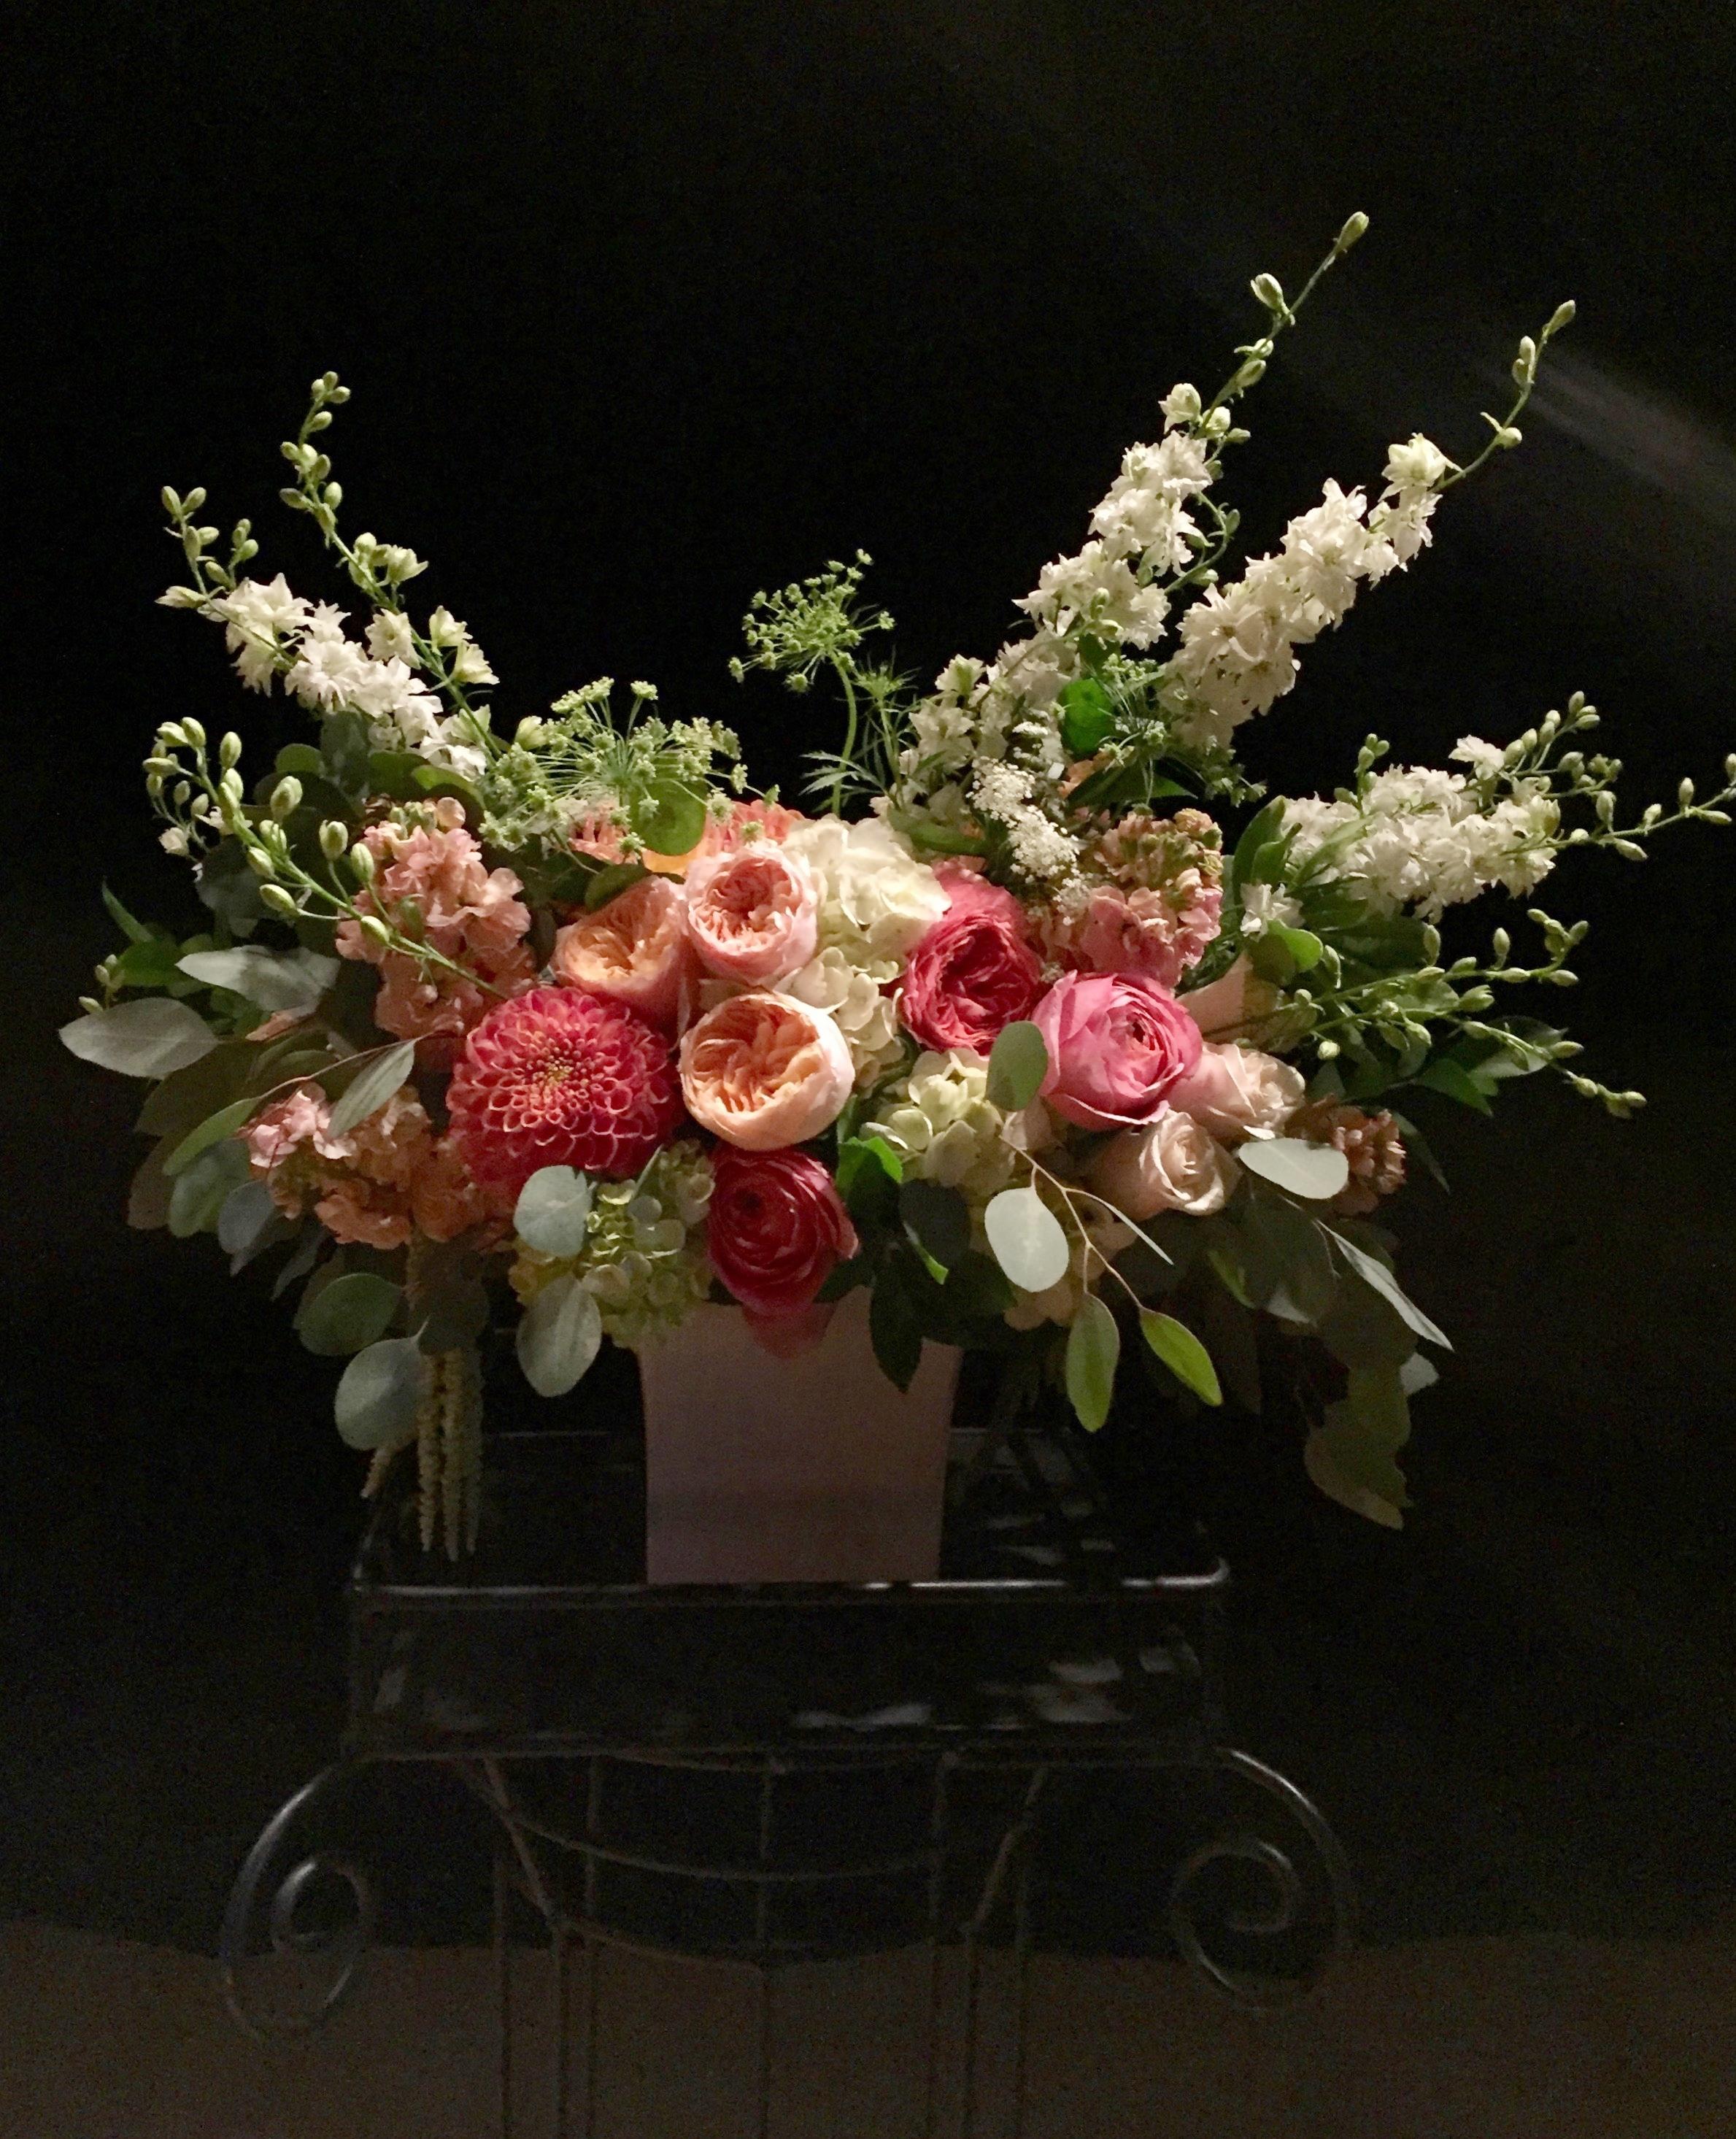 Ceremony pedestal, dahlias, juliett garden roses, larkspur